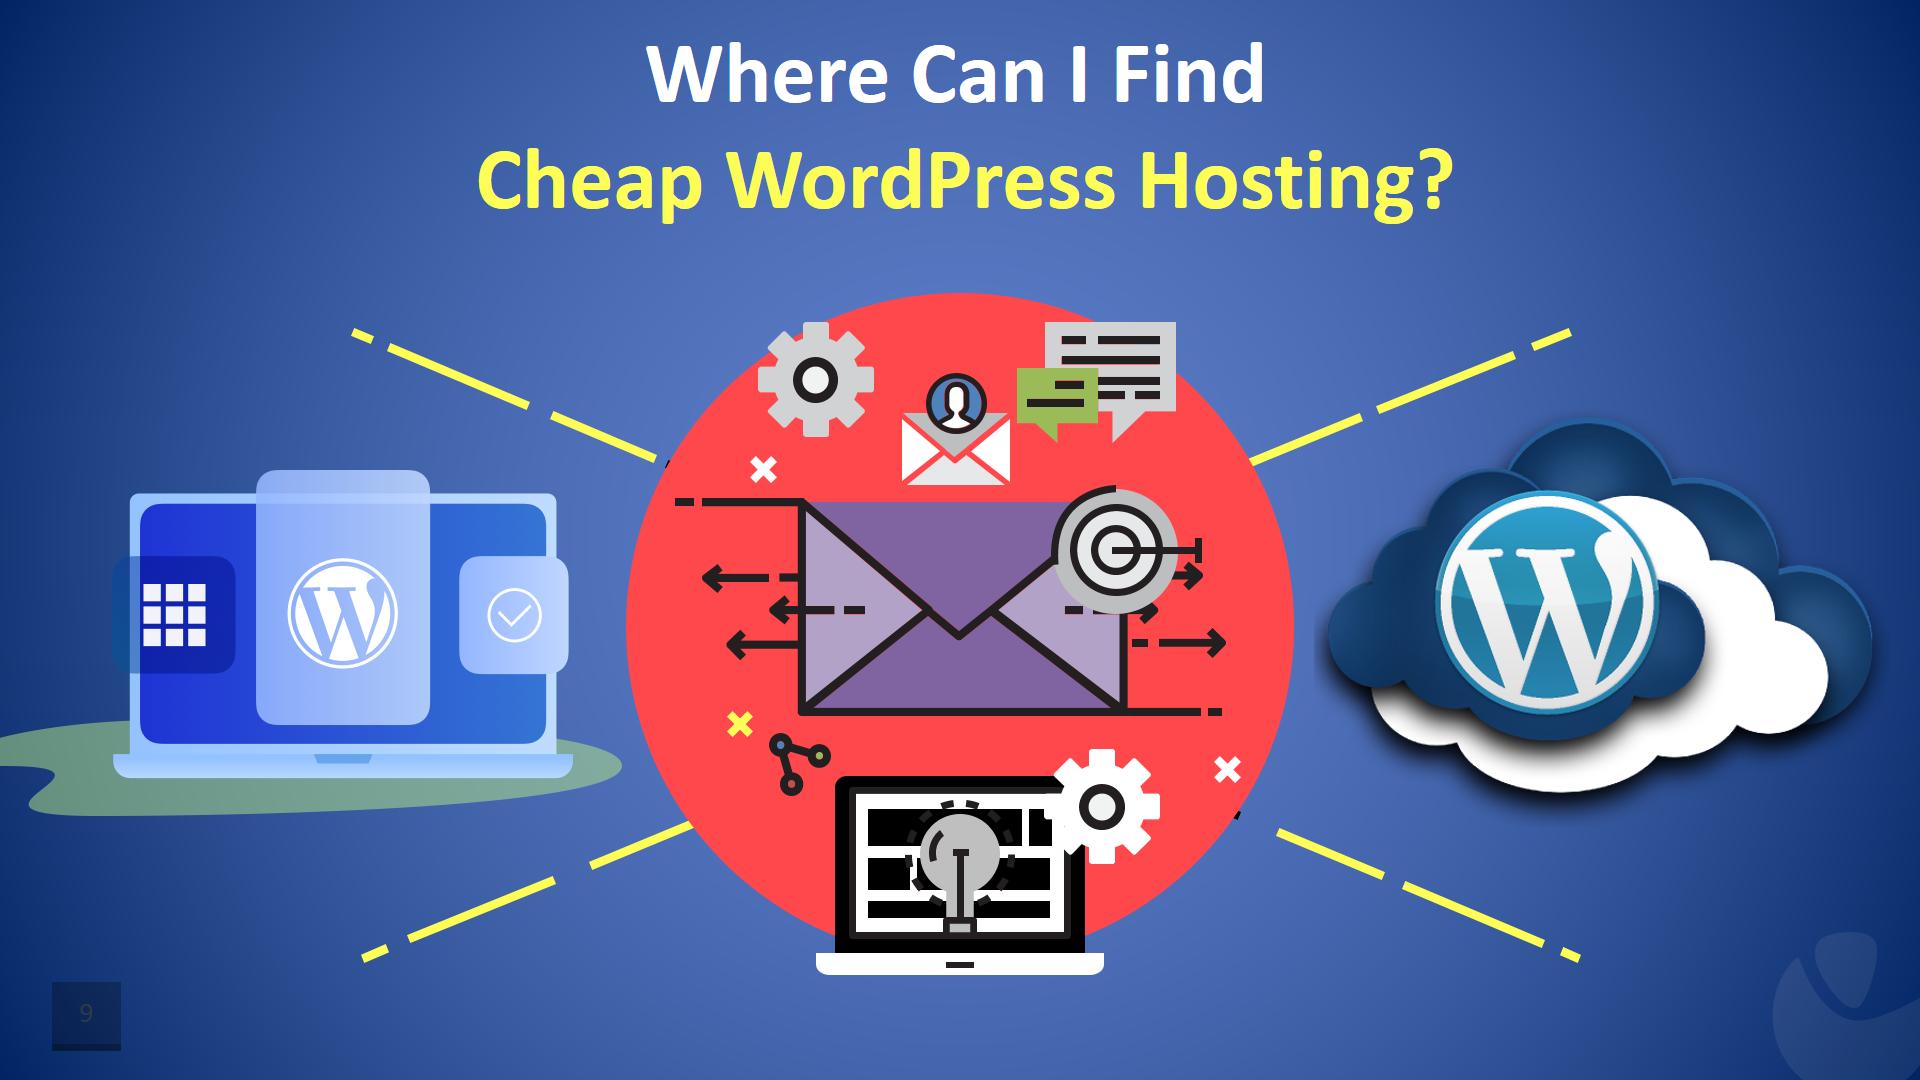 Where Can I Find Cheap WordPress Hosting?